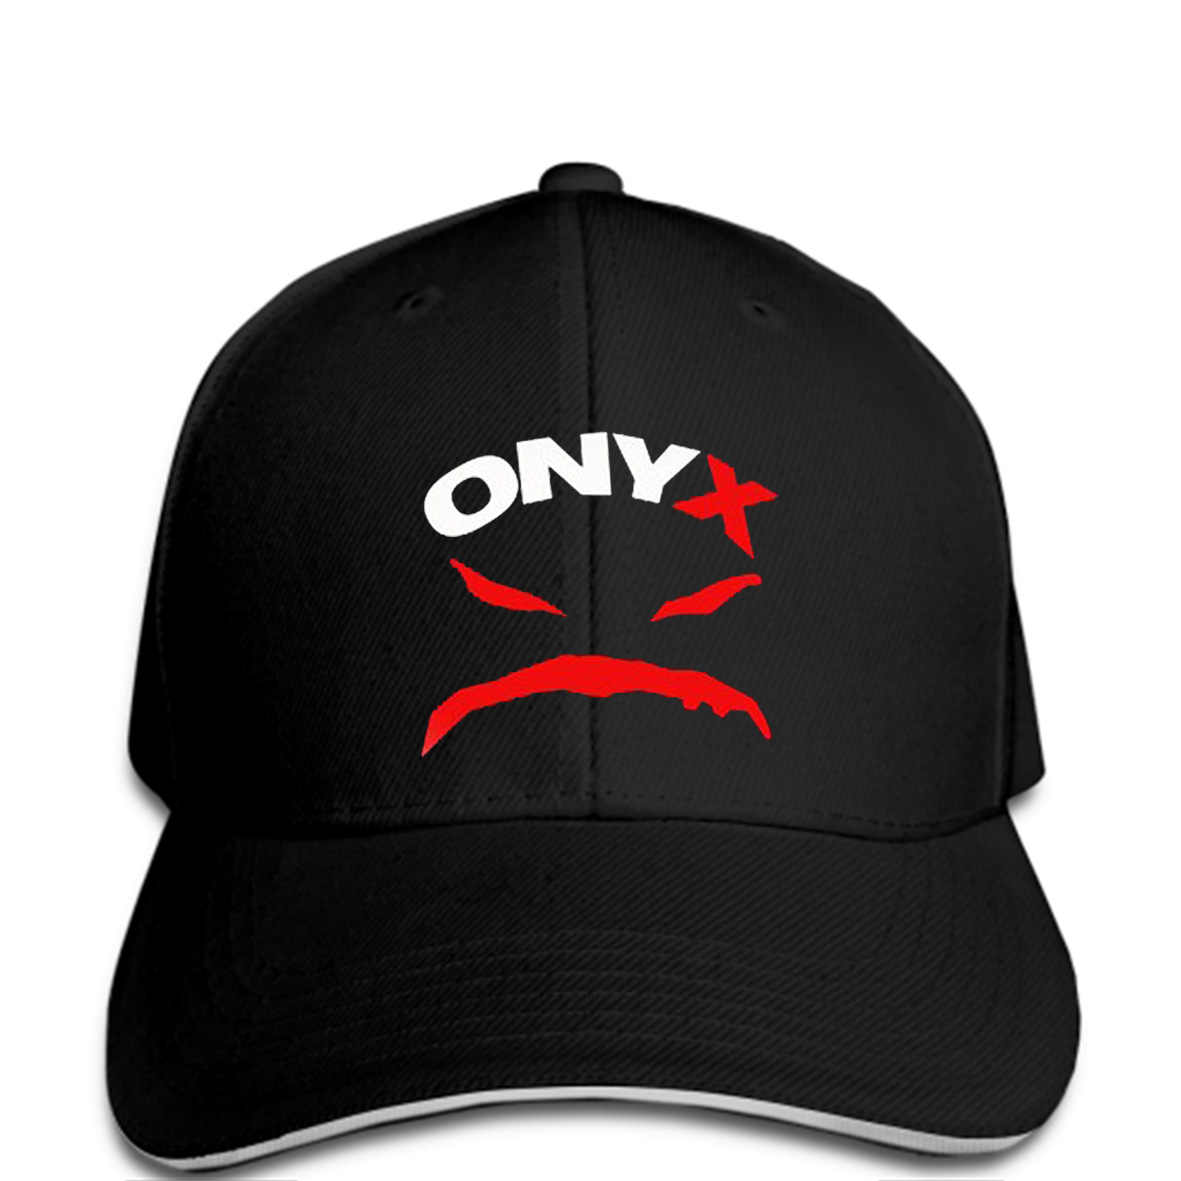 a19594b33921f New Men S Onyx Logo Rap Hip Hop Music Design Baseball cap Boy Cool Hipster  Printed Baseball